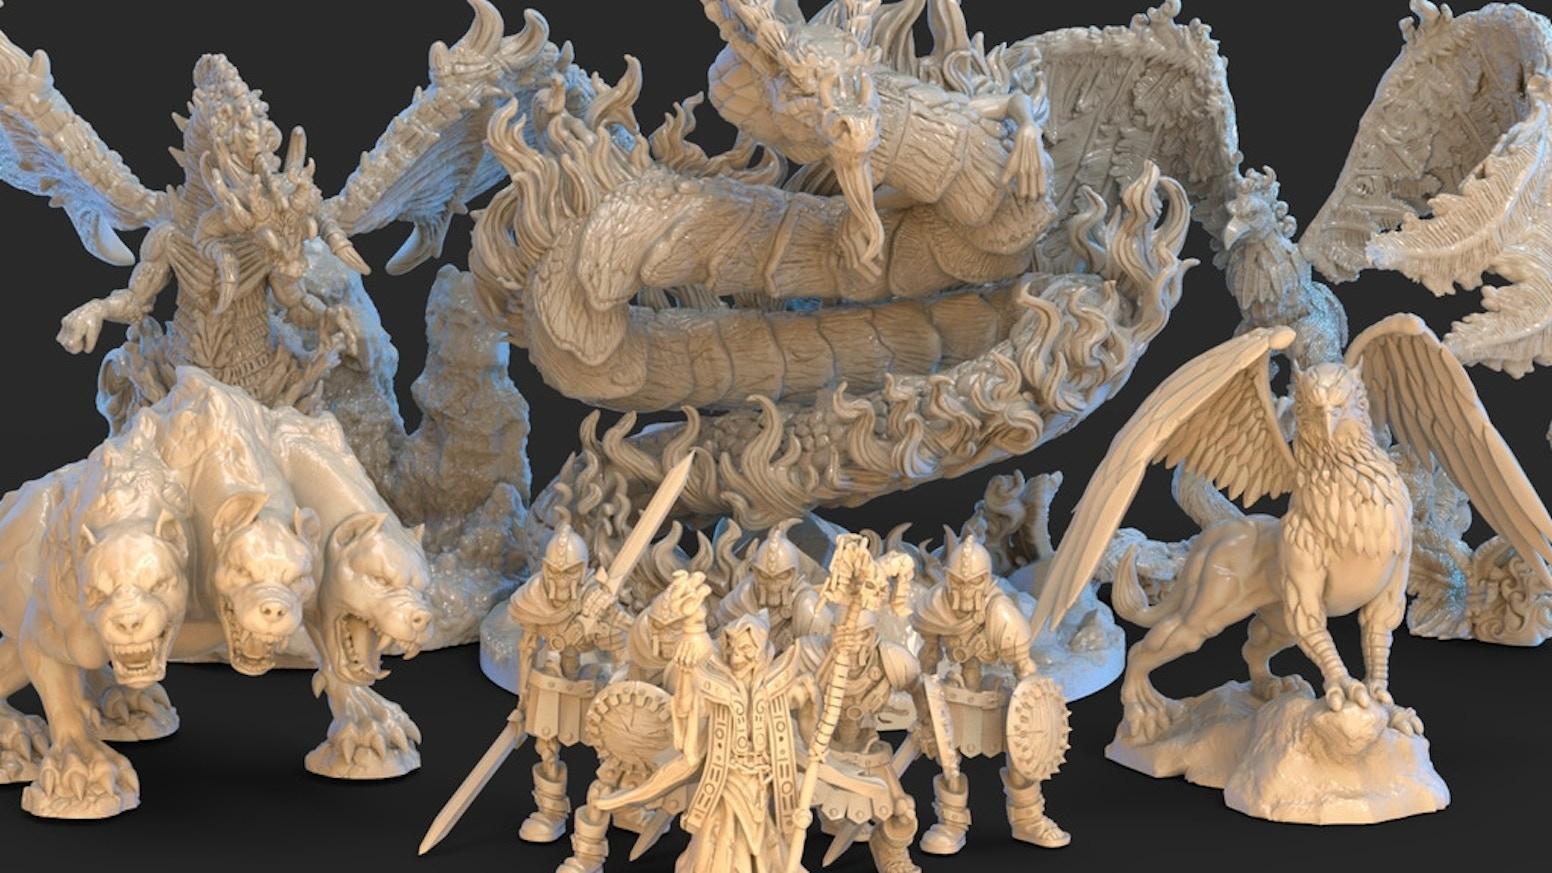 3D Printable Files, 32mm Scale, RPG / wargaming